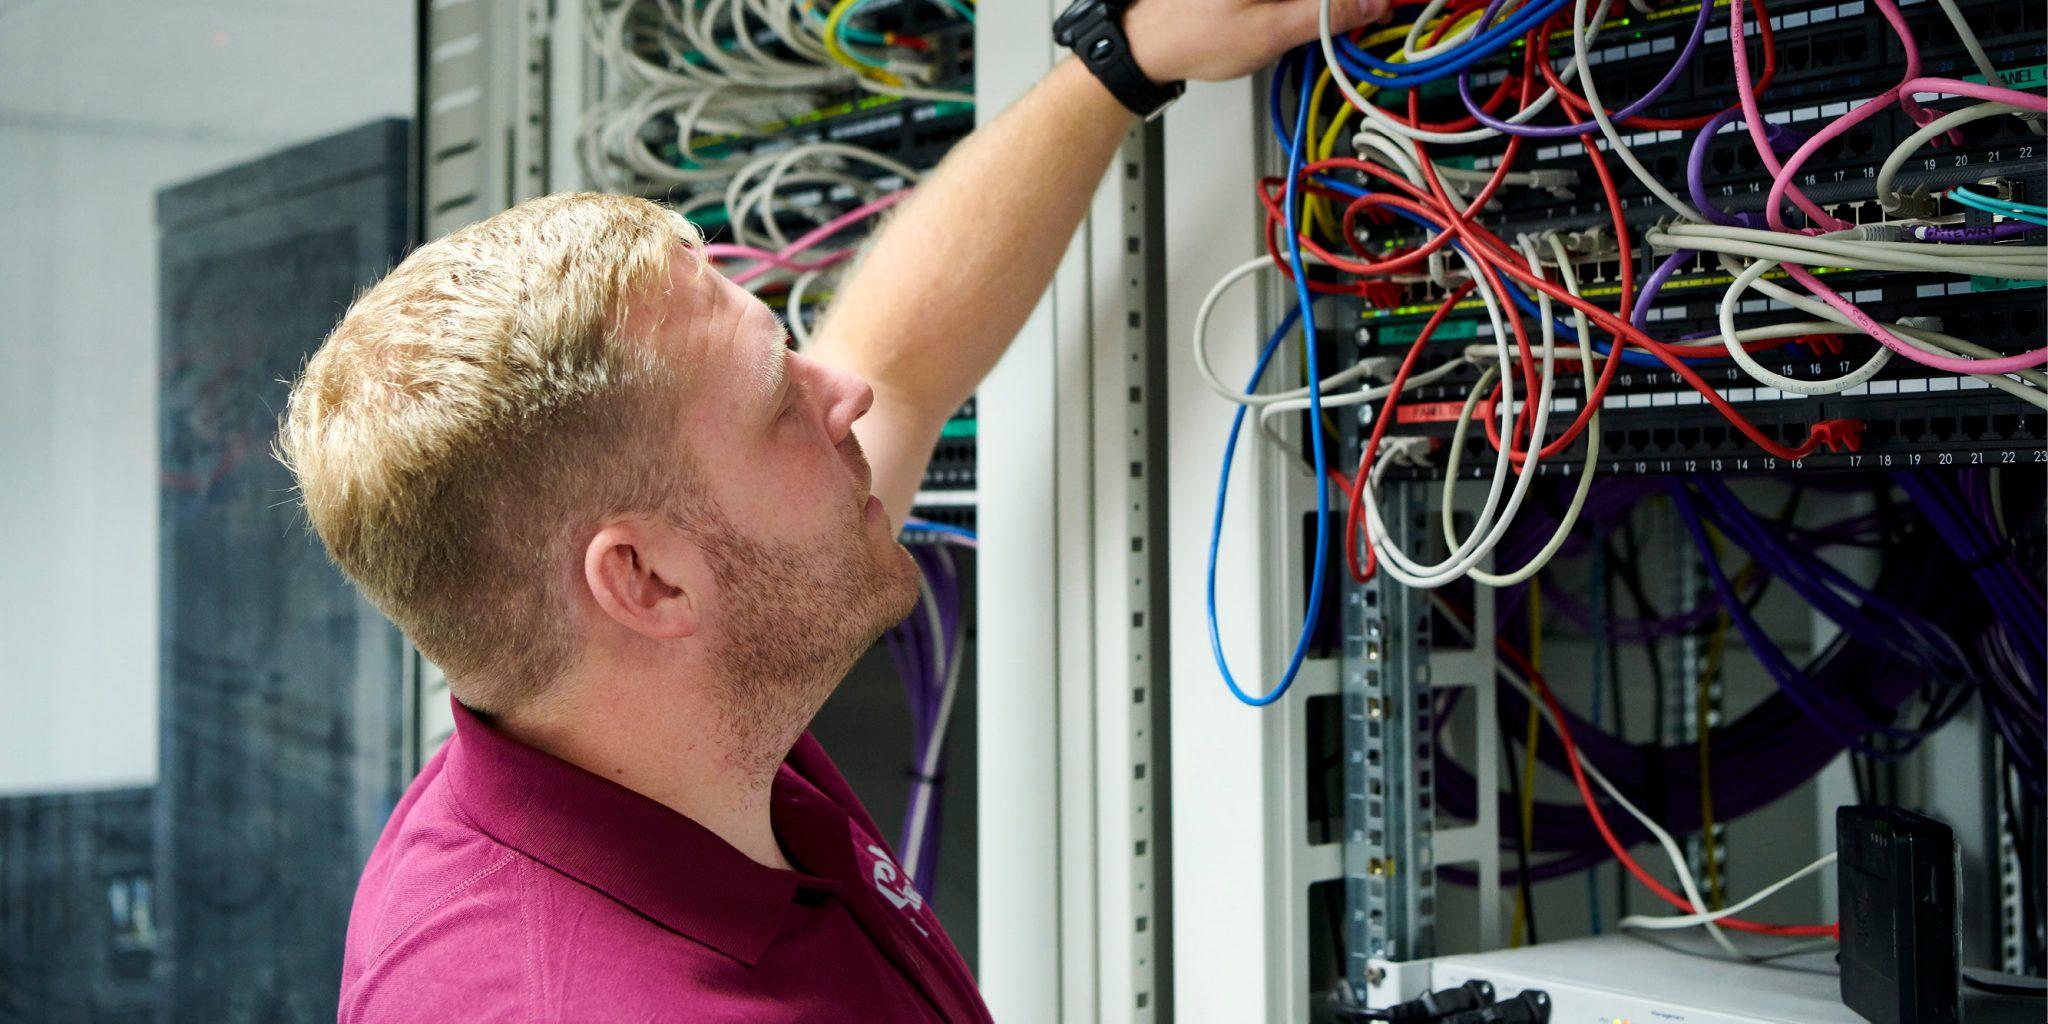 ICT worker working on server